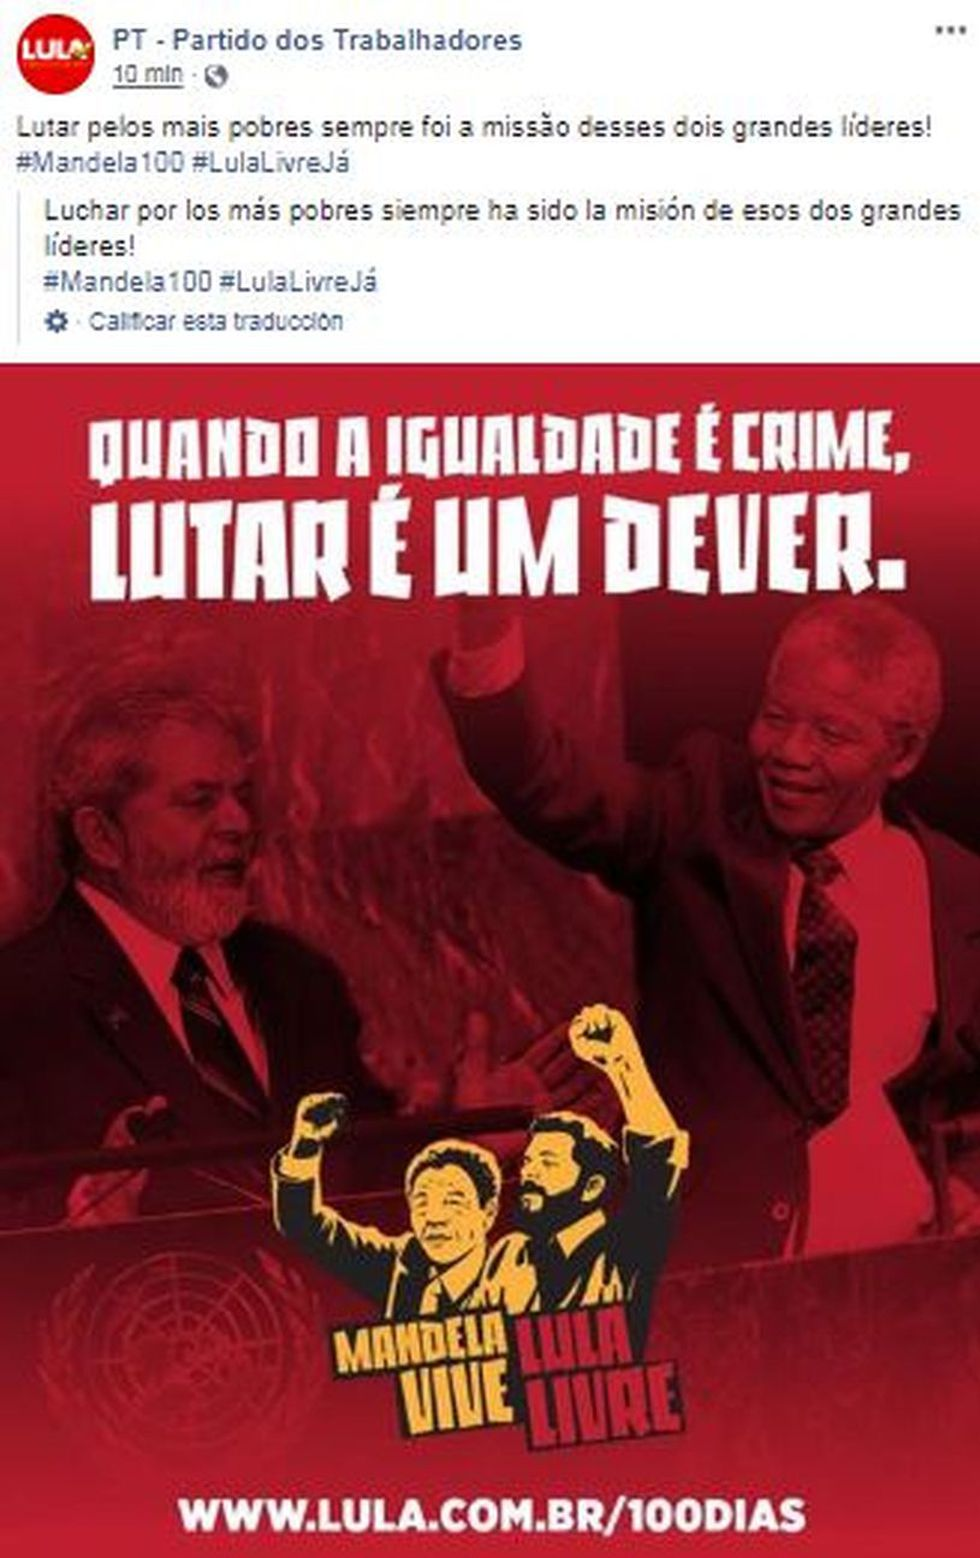 (Captura: Facebook/@pt.brasil)